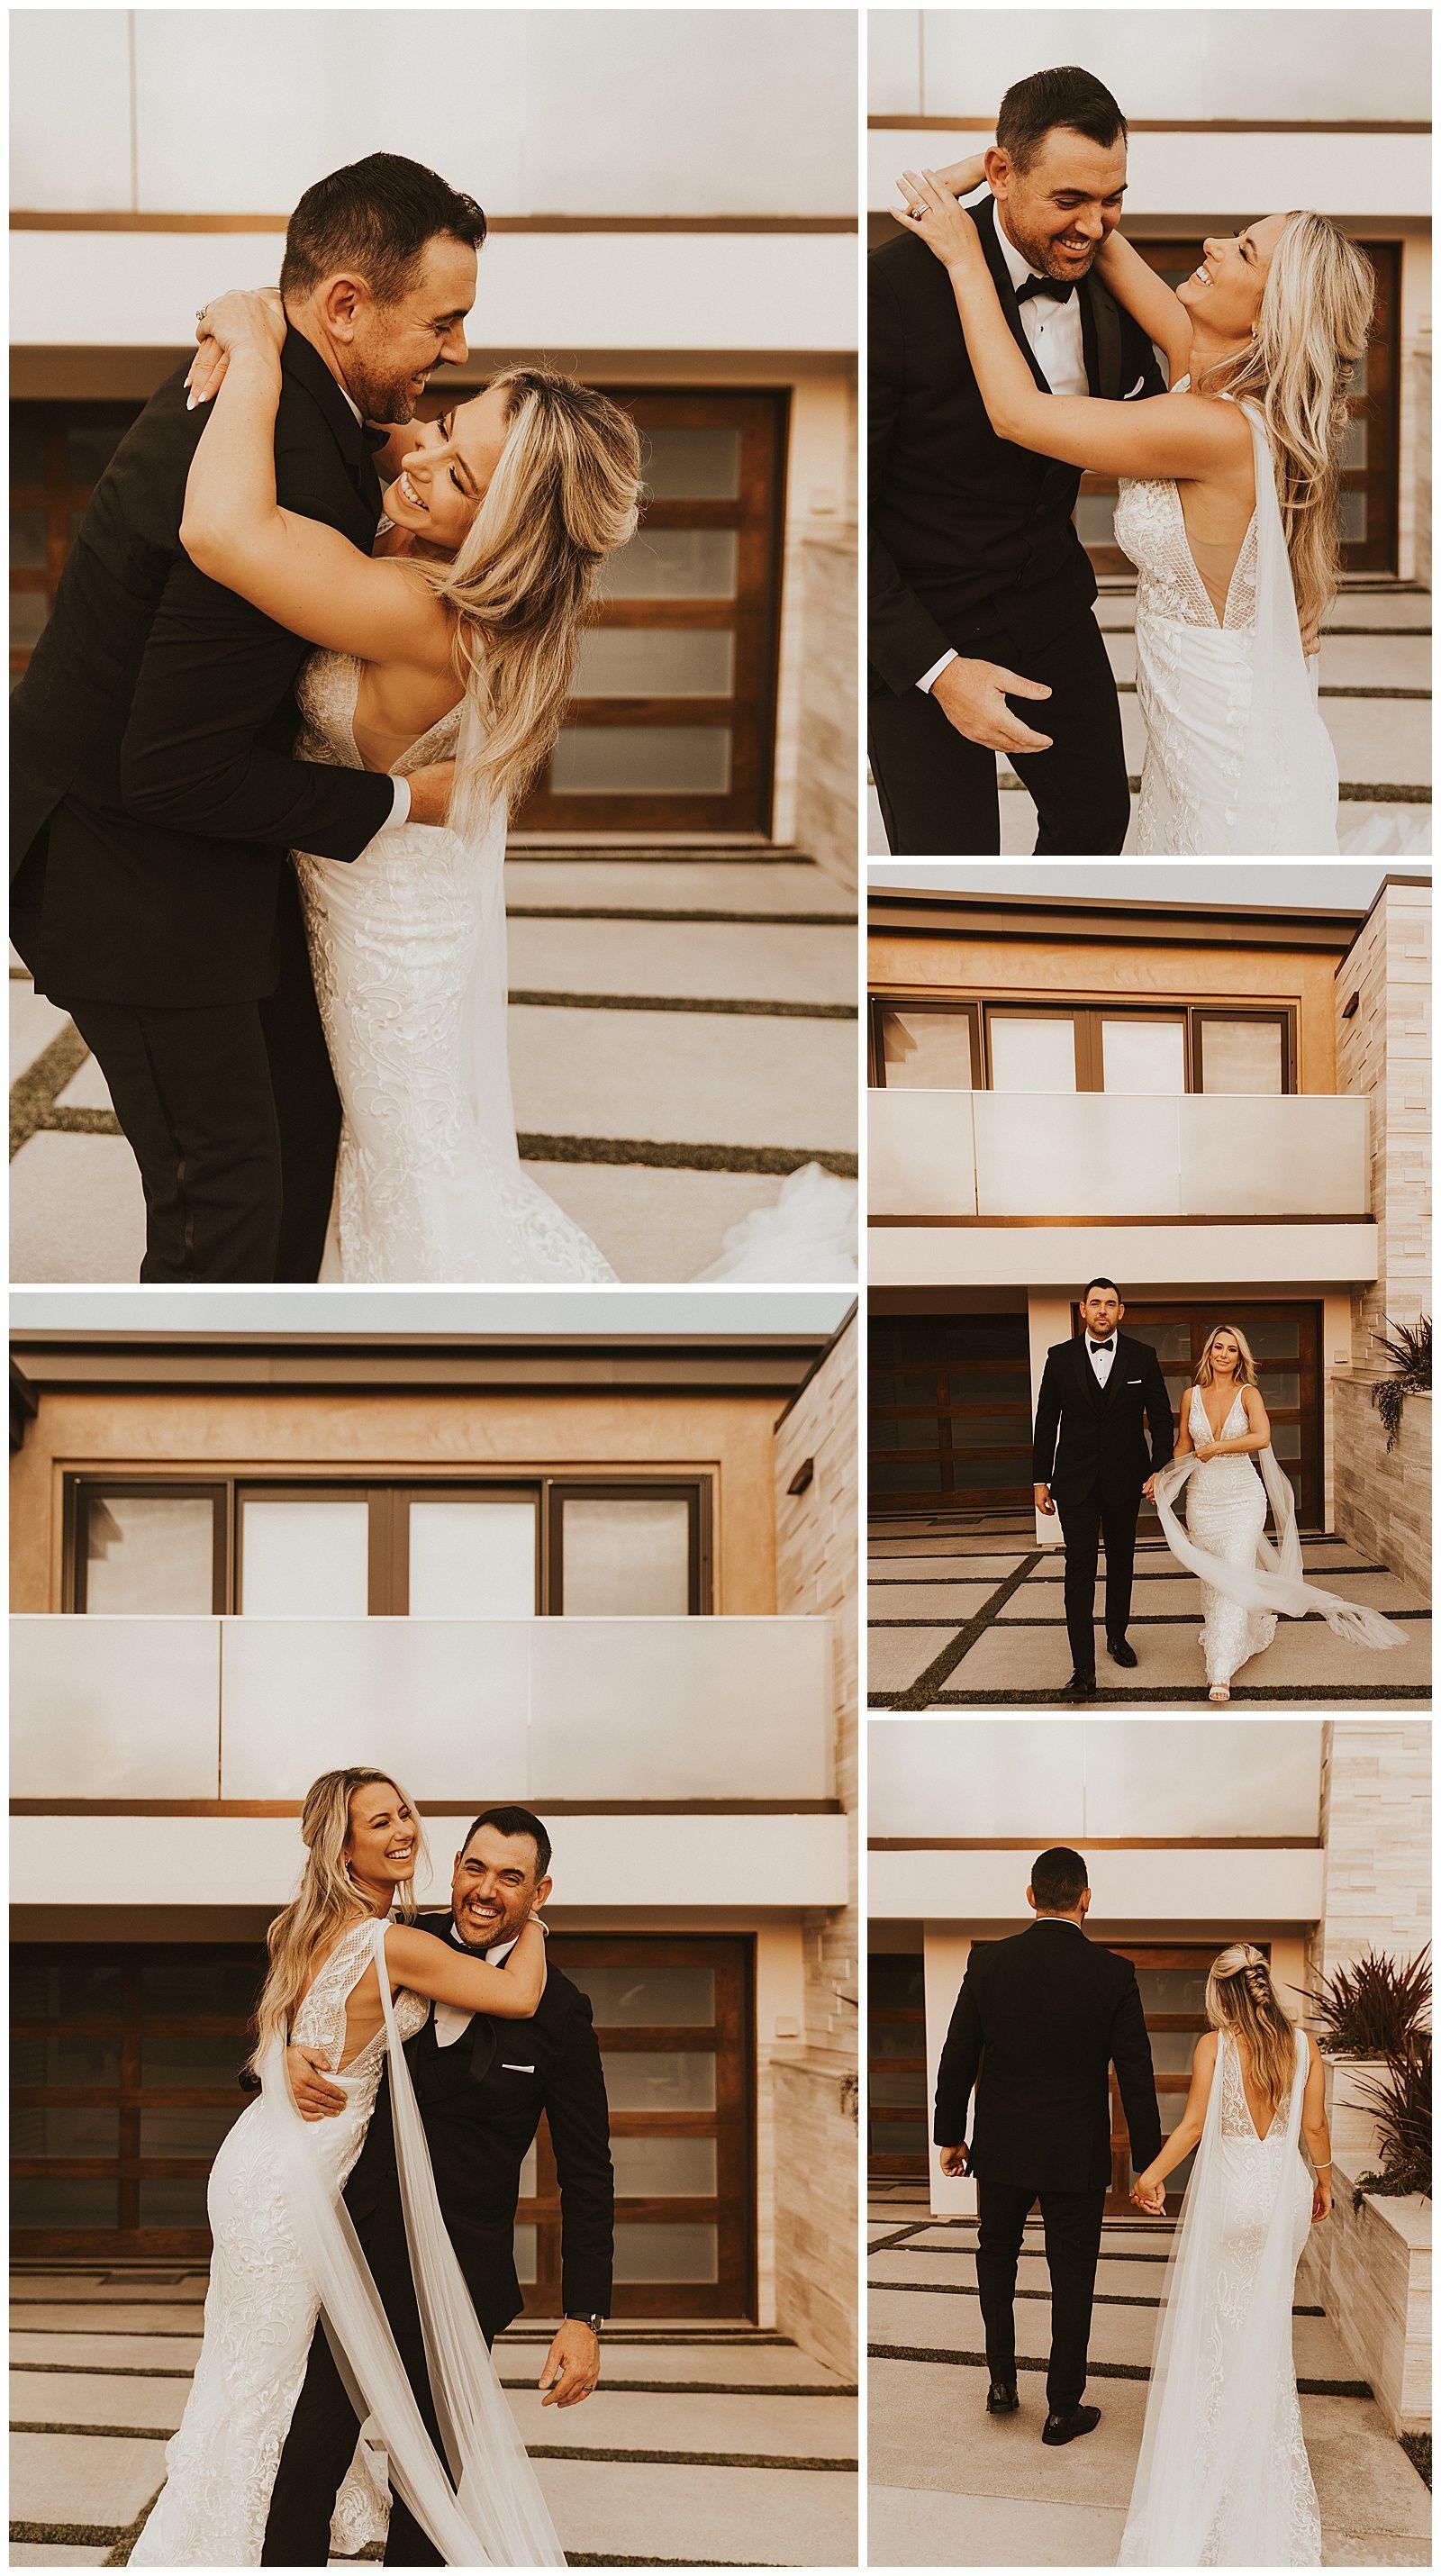 Laguna Beach Elopement Orange County Wedding Photographer In 2020 Wedding Southern California Orange County Wedding Photographer Orange County Wedding